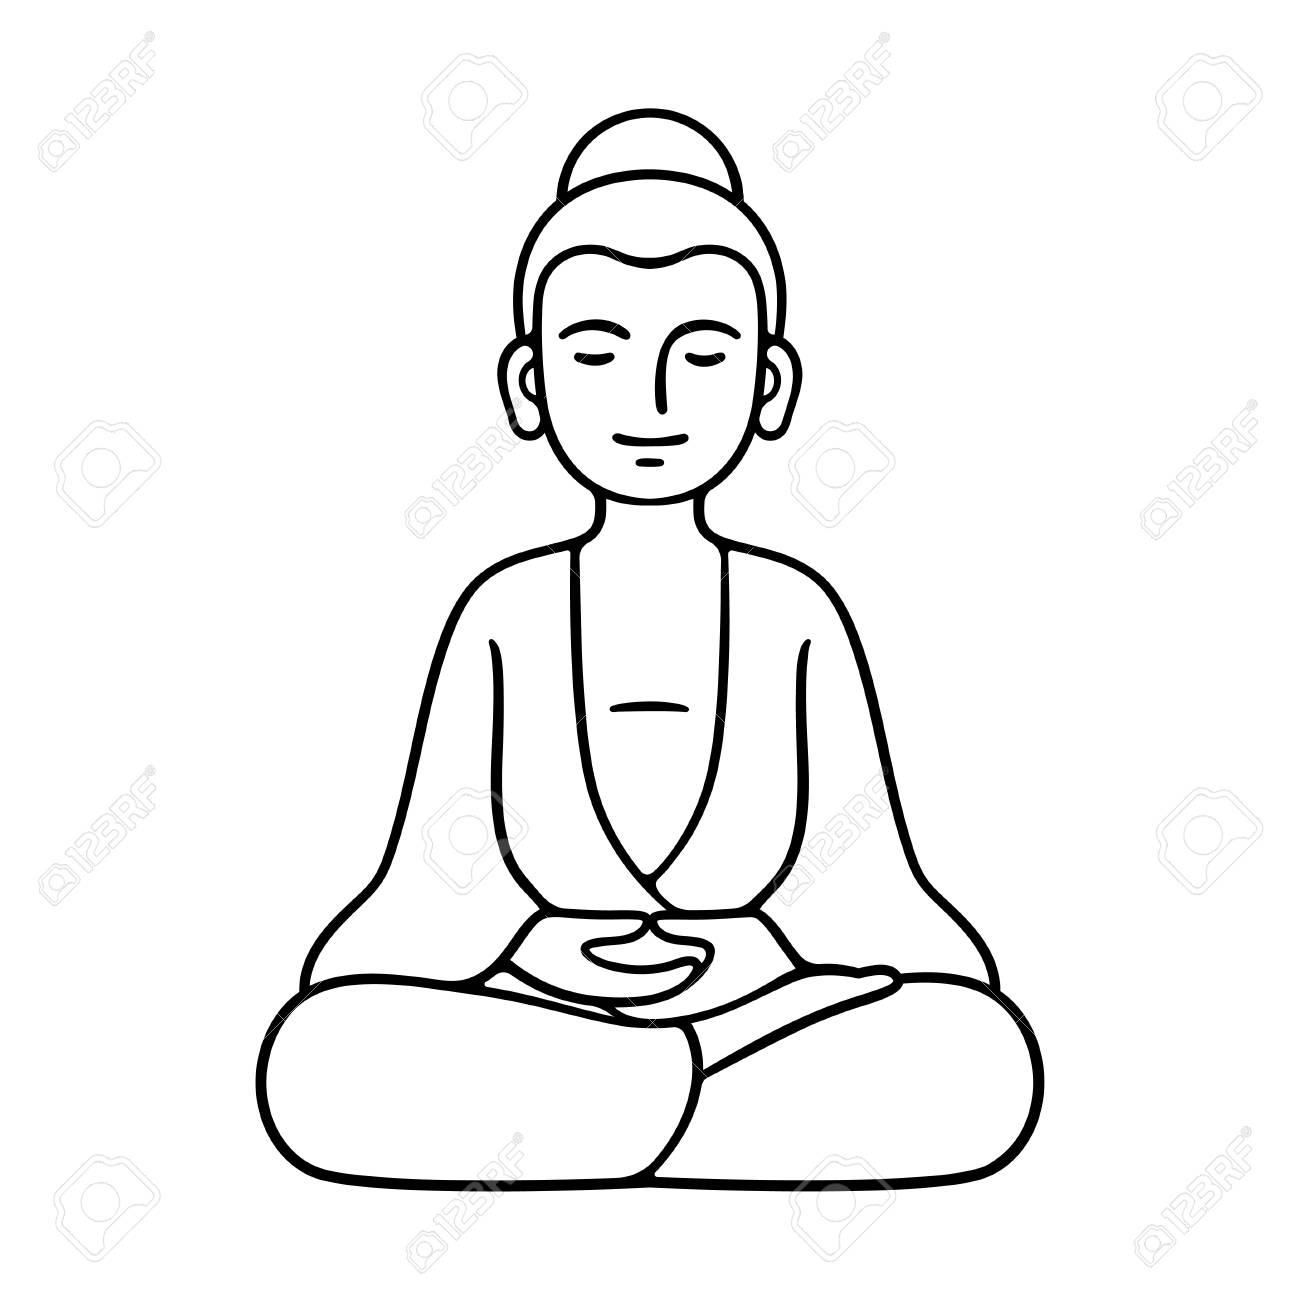 Simple and minimal buddha statue sitting in meditation zen buddhist